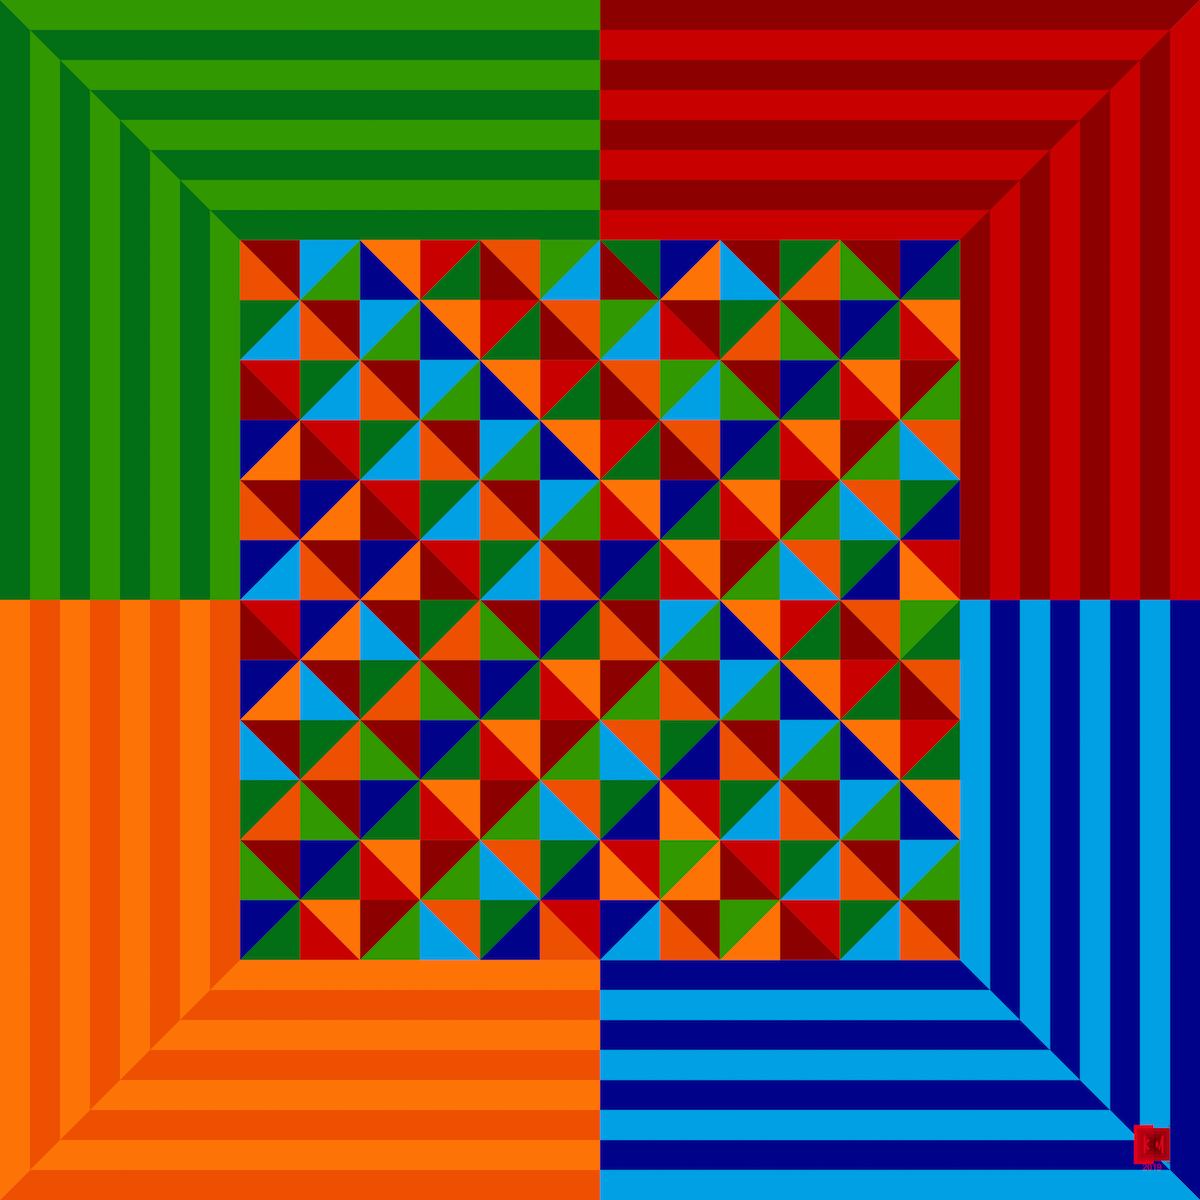 120 (800 x 800).jpg